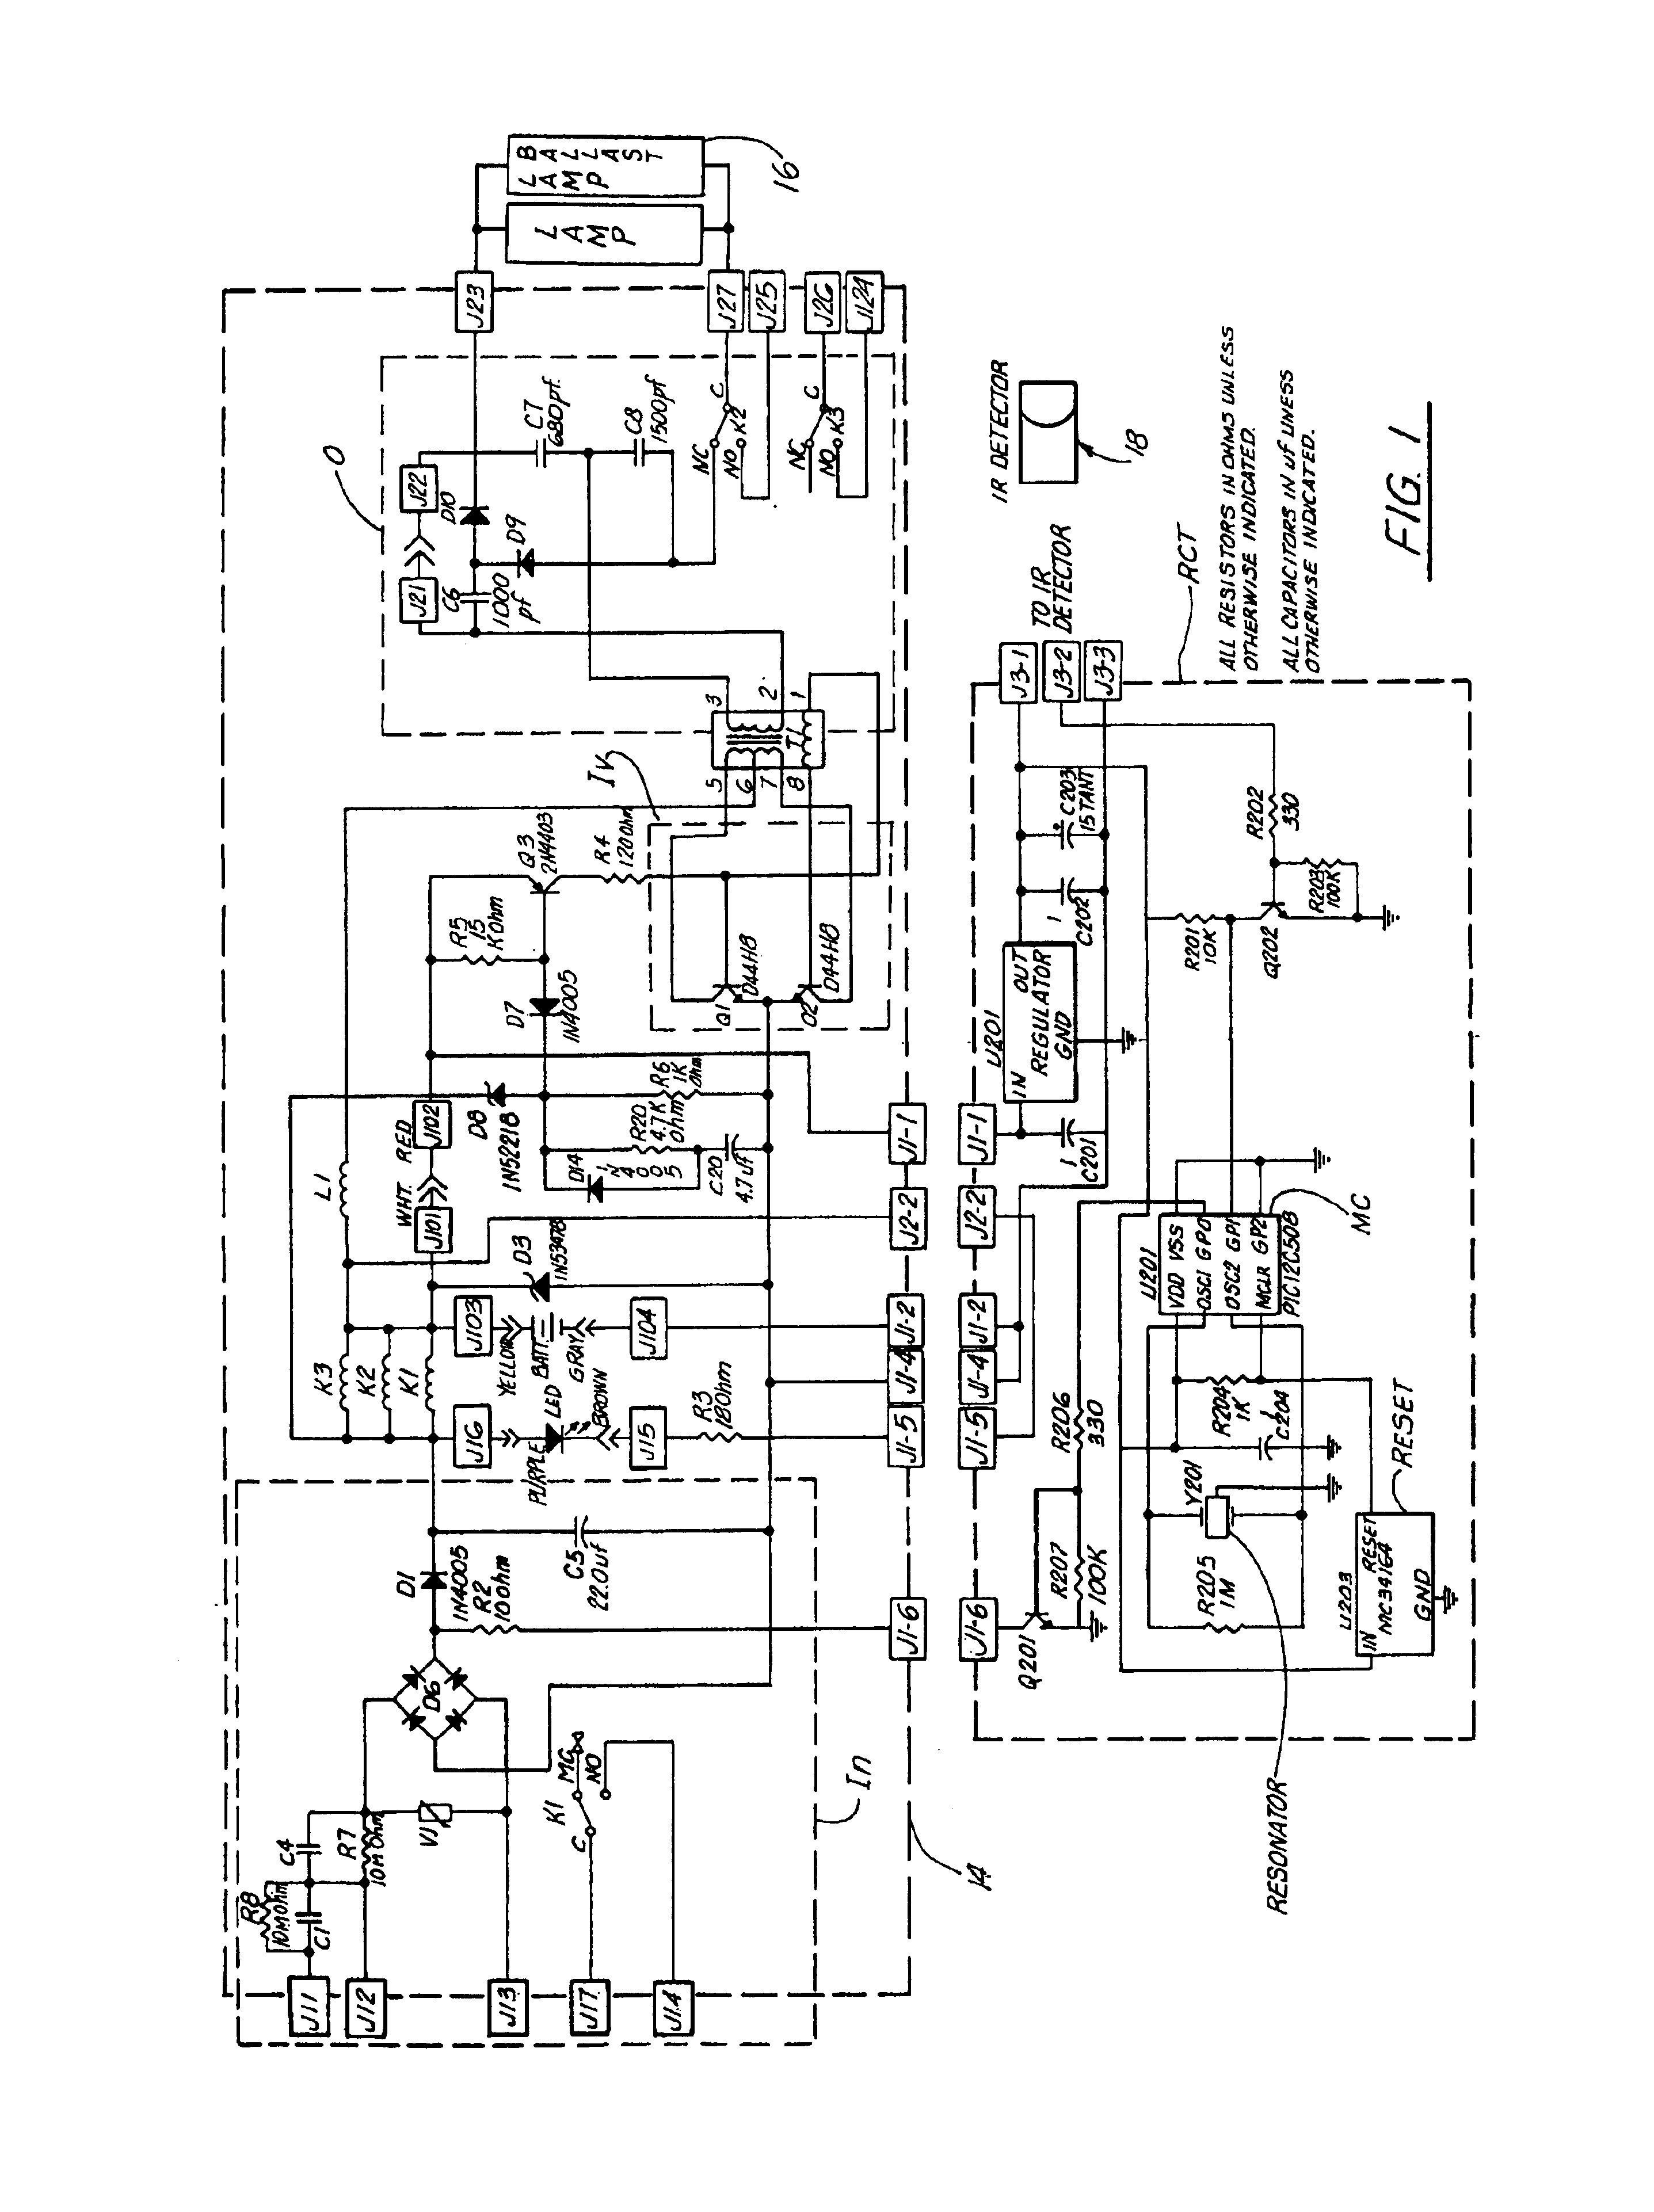 rv monitor panel wiring diagram